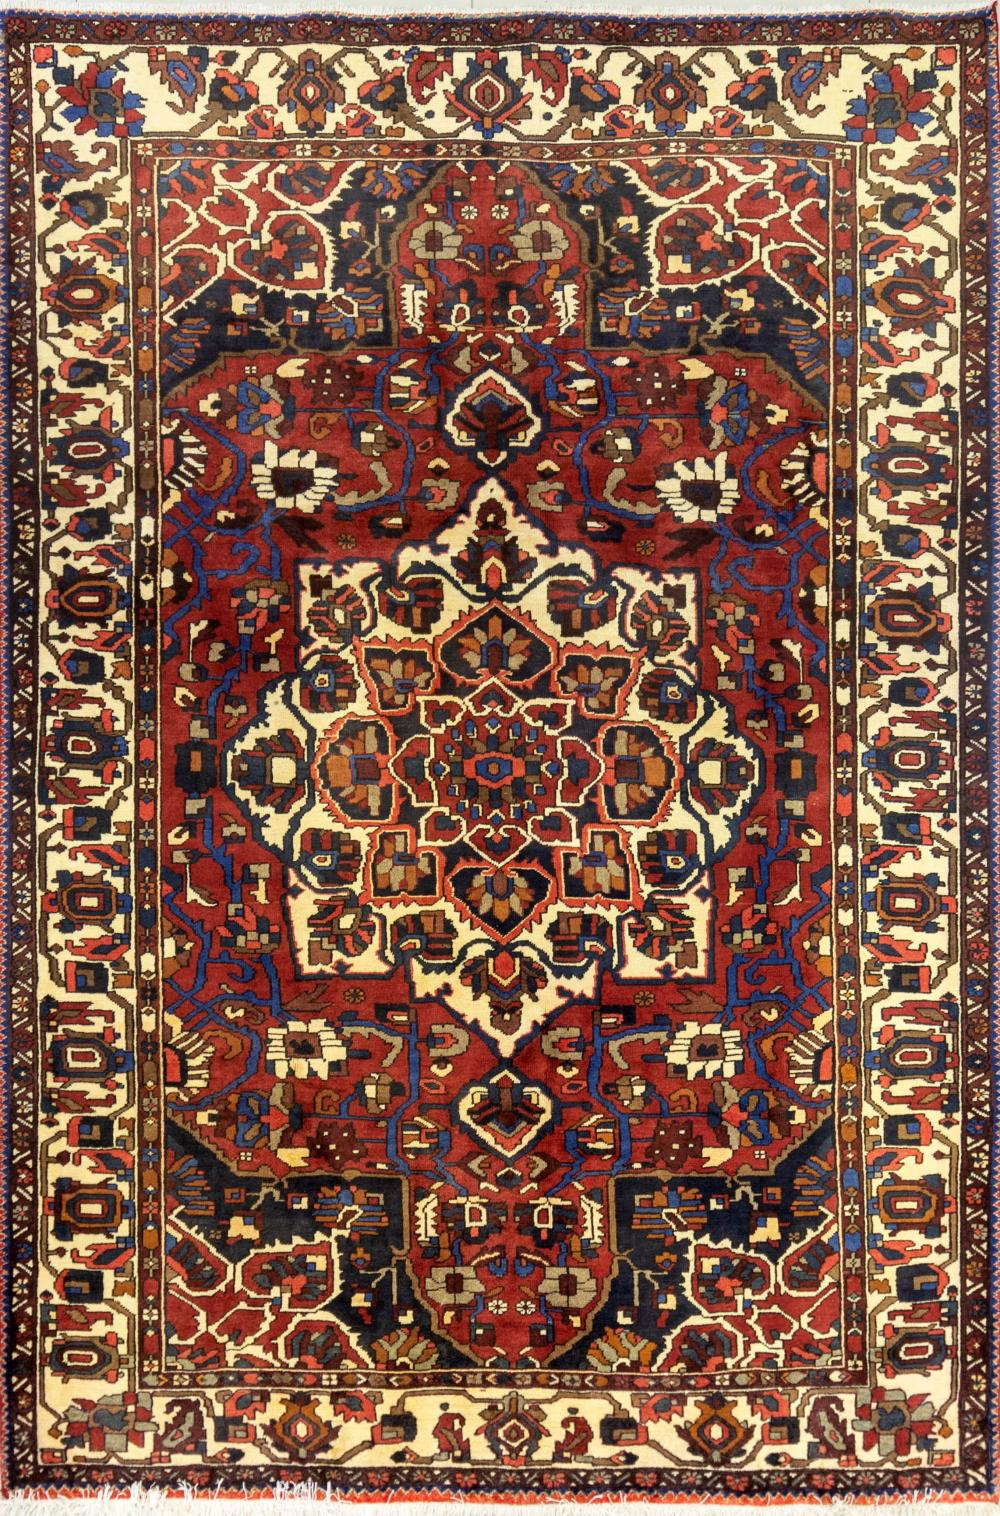 Lot - A Persian Hand Knotted Bakhtiari Carpet, 301 X 201